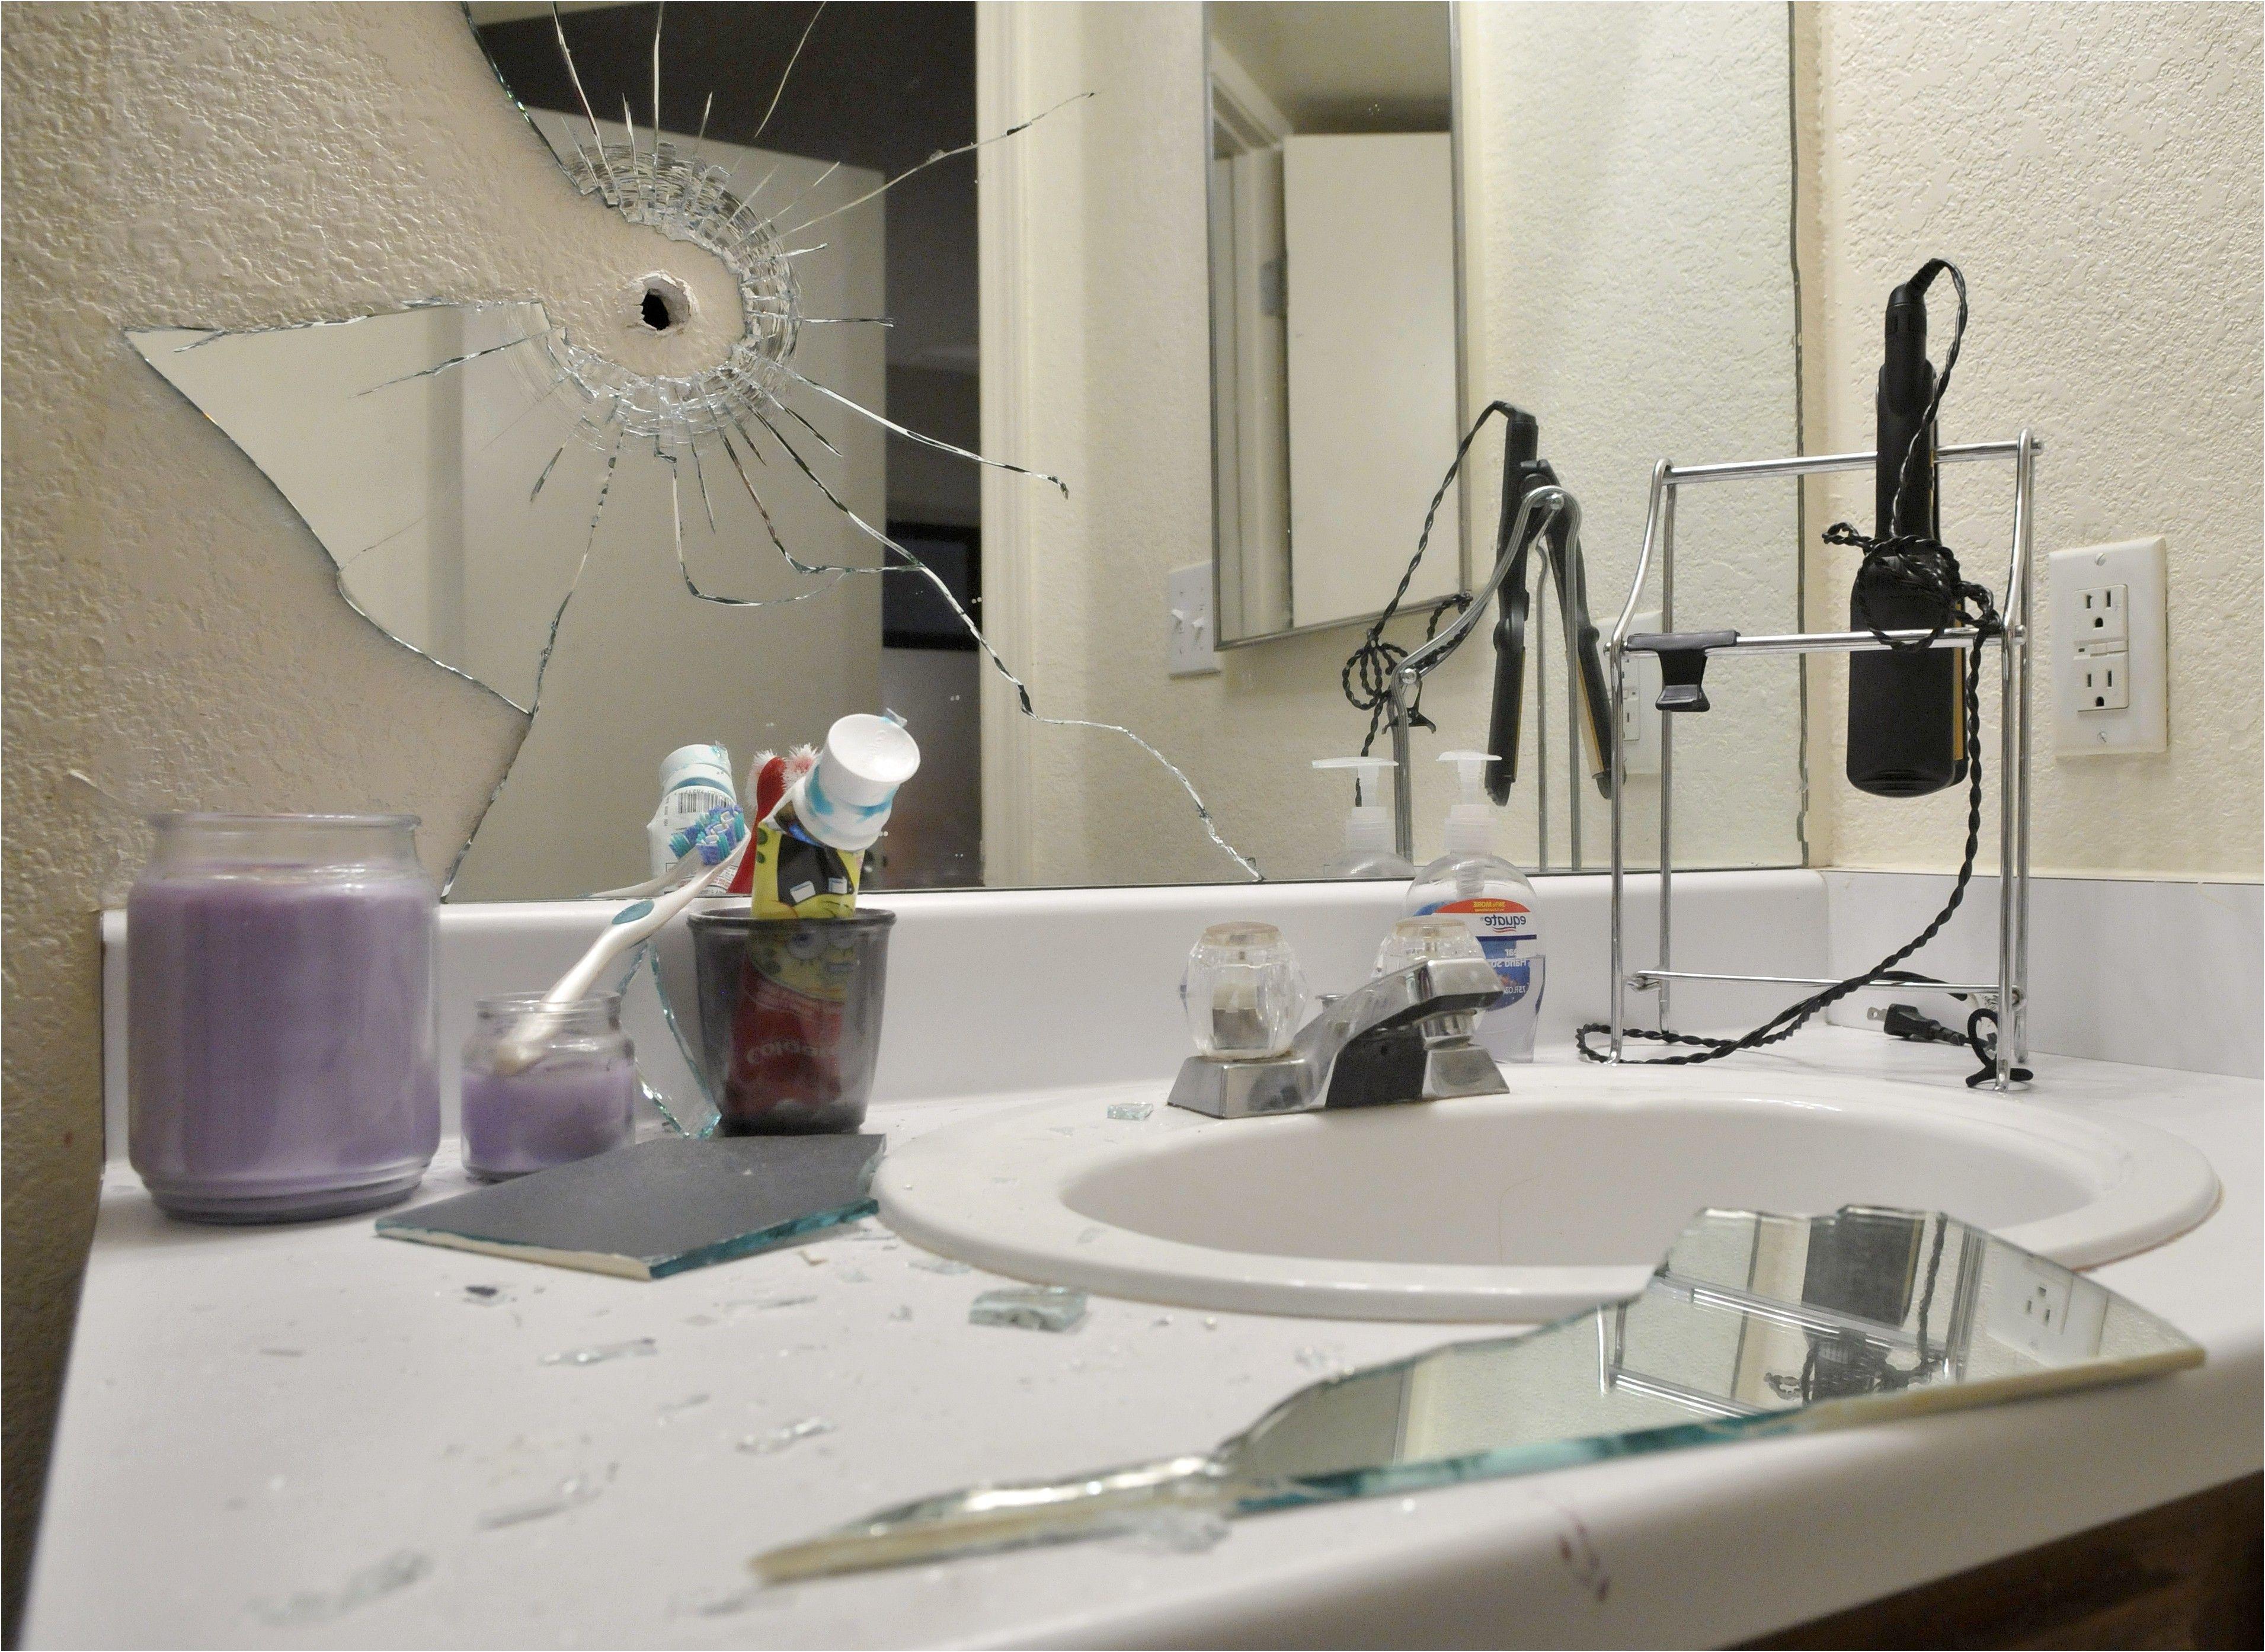 Broken mirror in bathroom universalcouncilfo from broken bathroom mirror for Shattered mirror bathroom floor